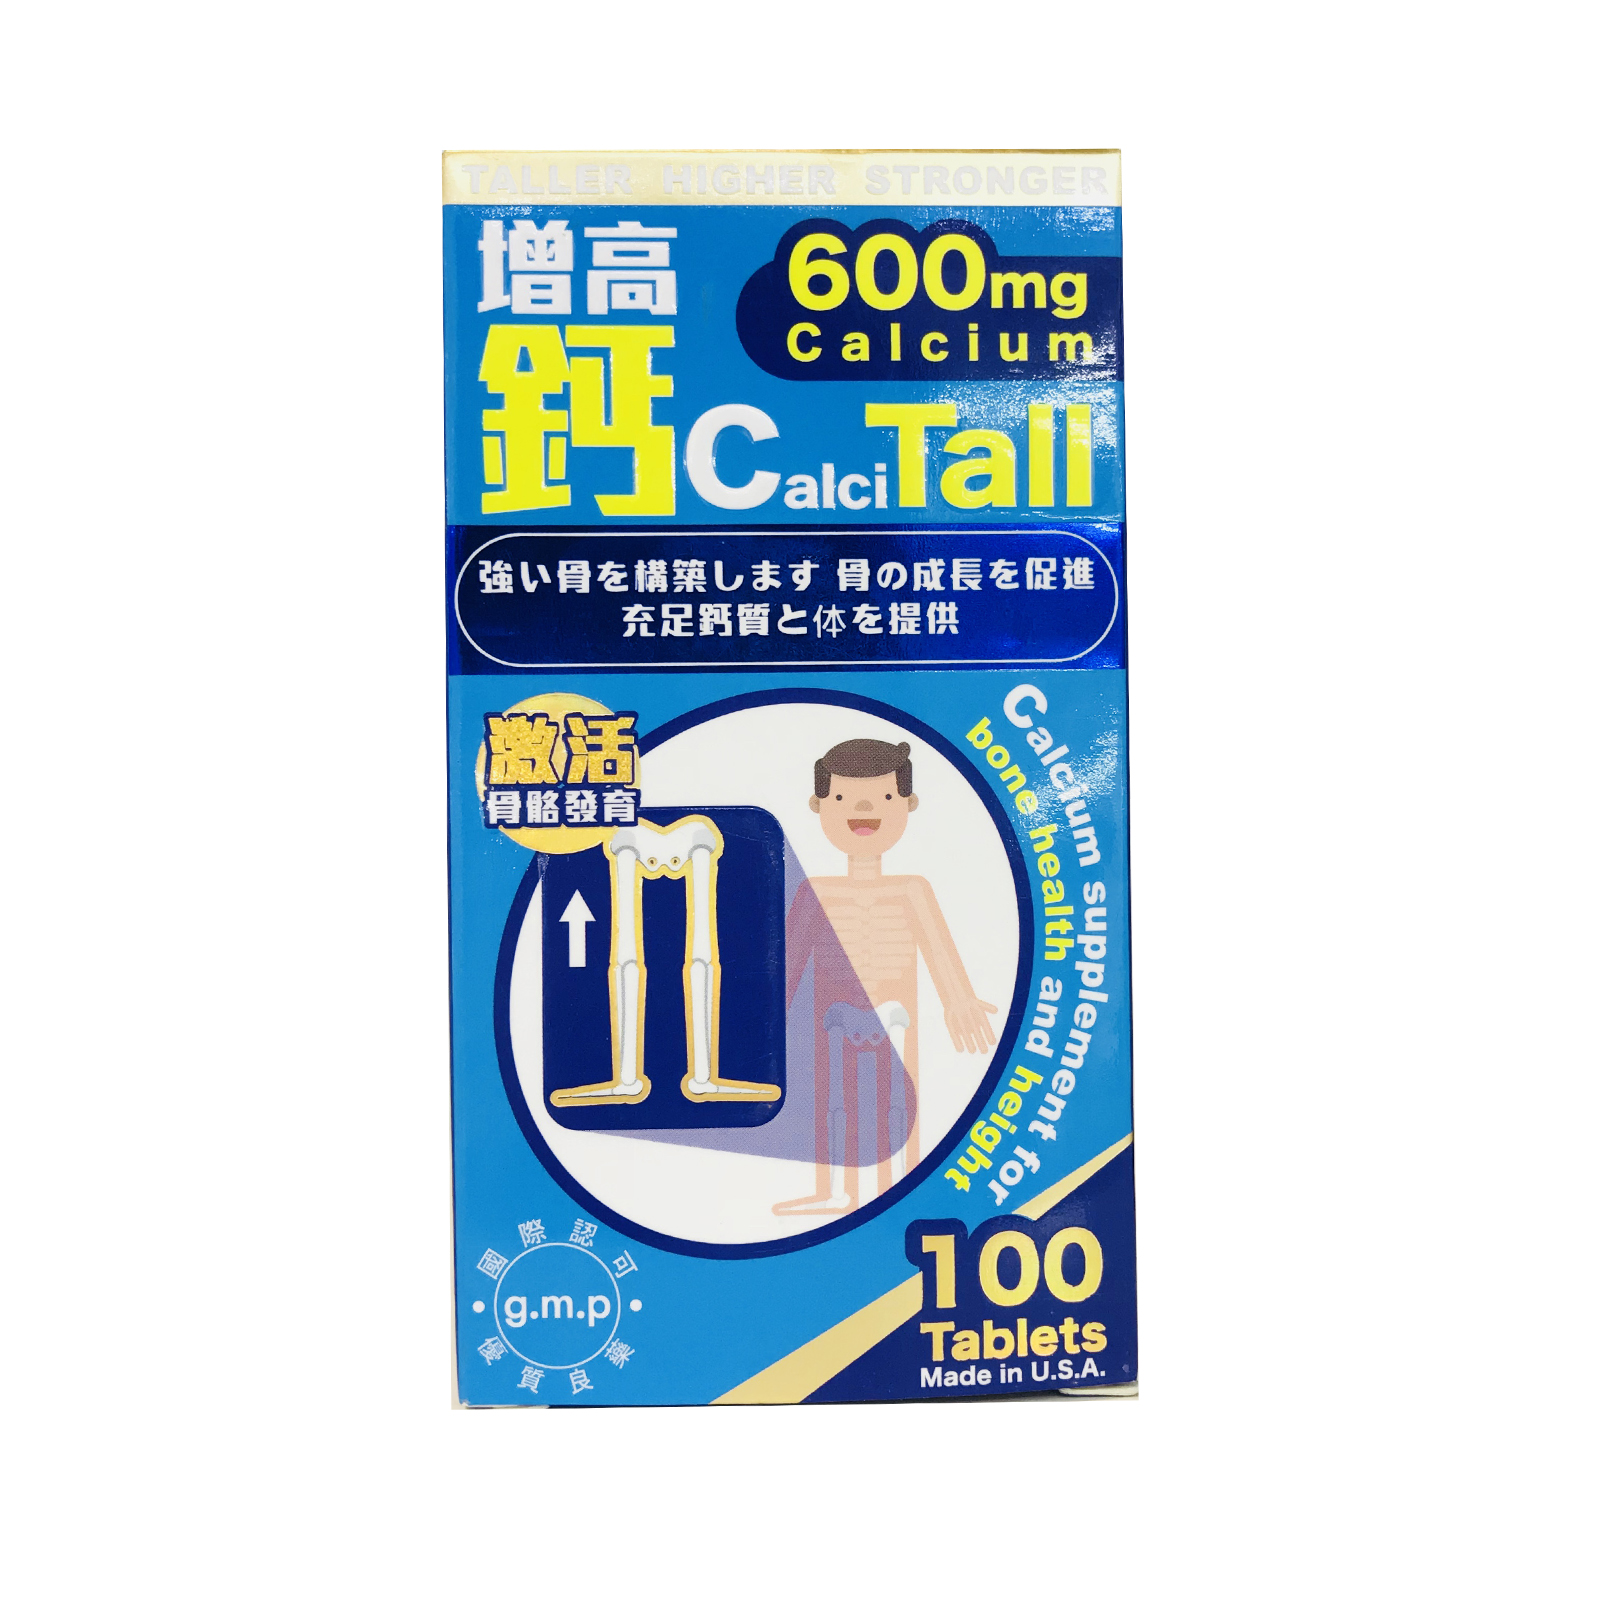 Calci Tall 增高钙 600mg 100粒